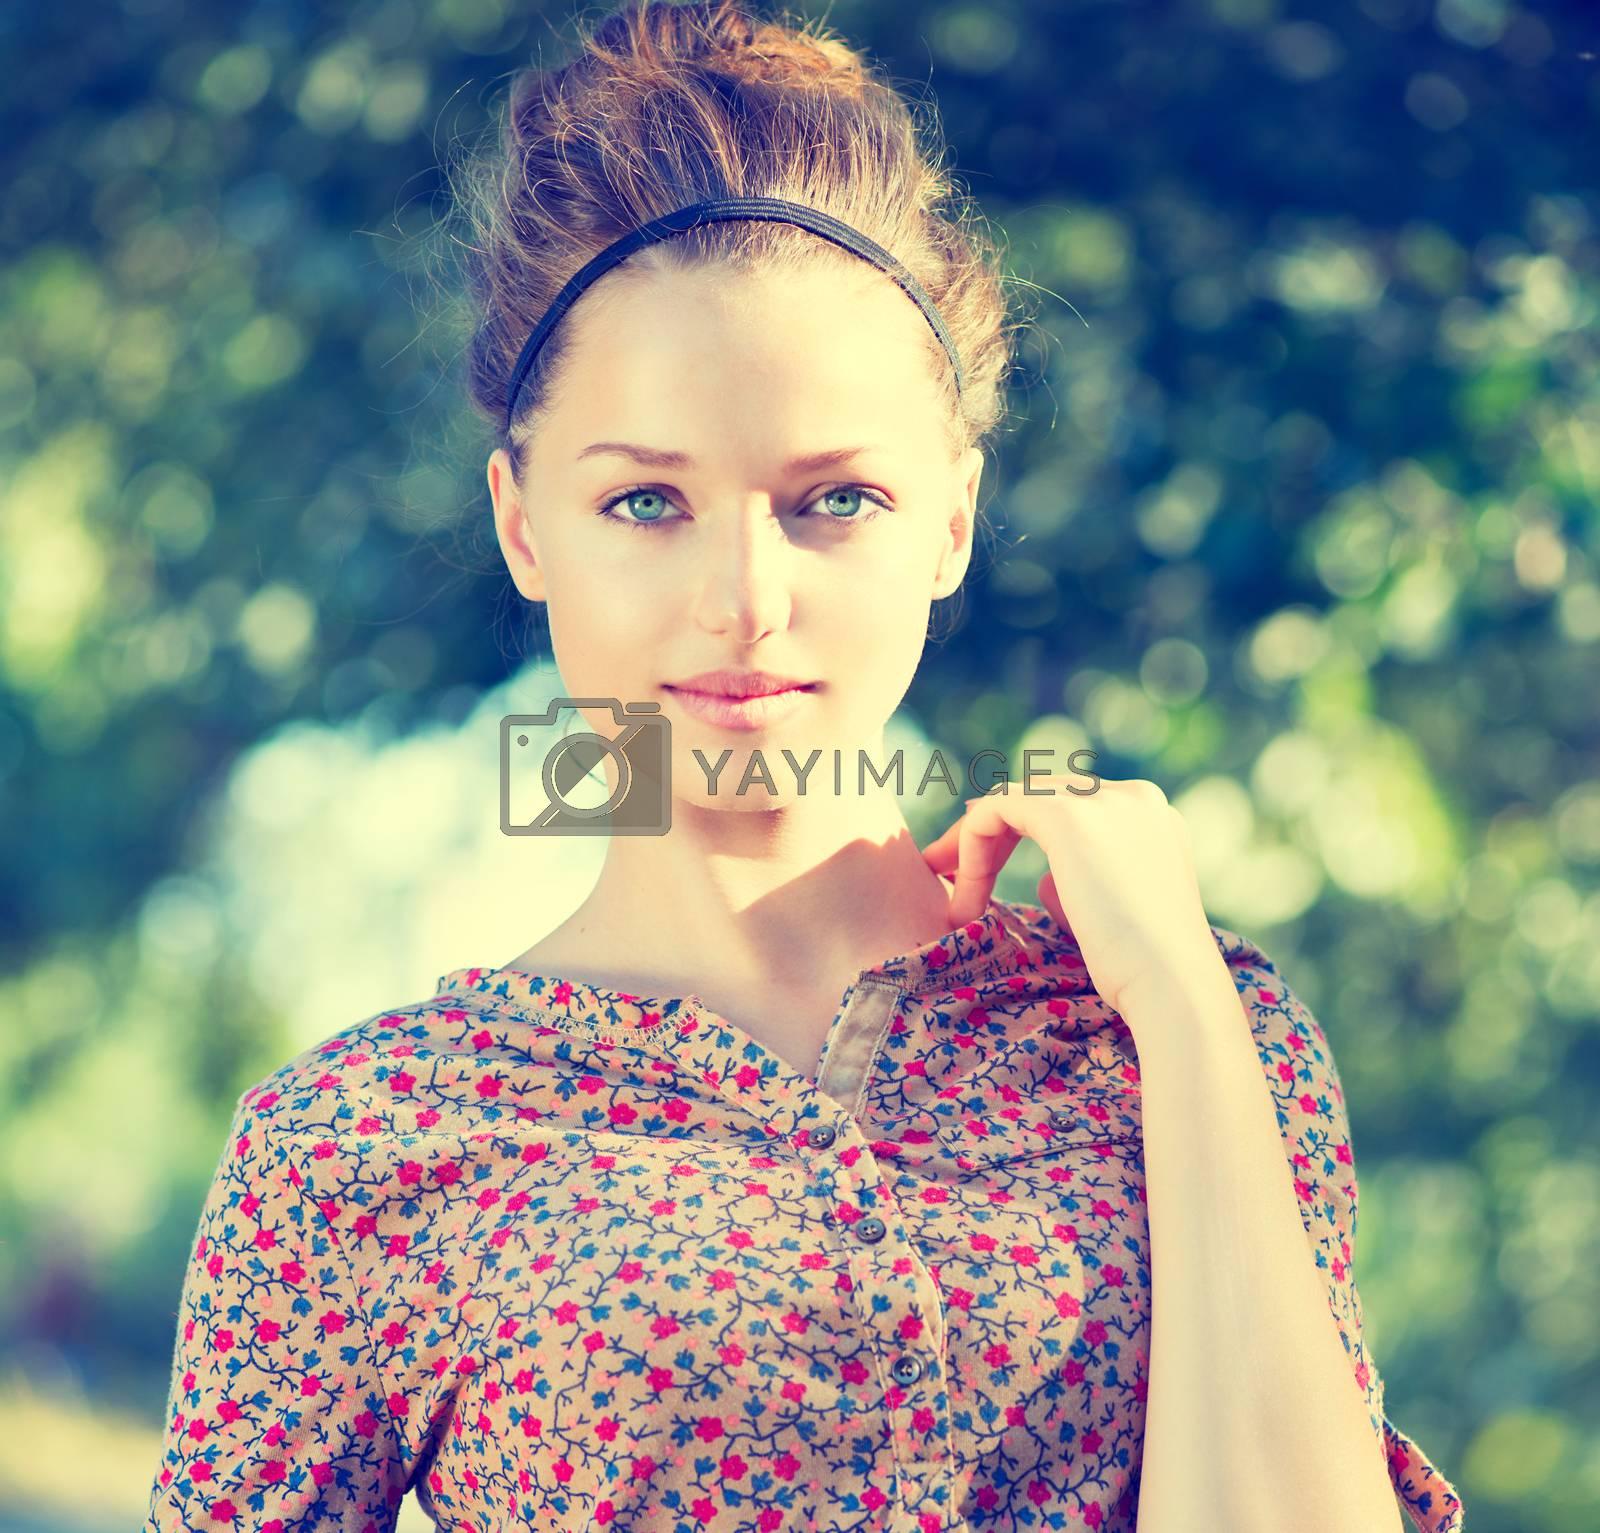 Beauty Teenage Model Girl over Nature Green Background by SubbotinaA